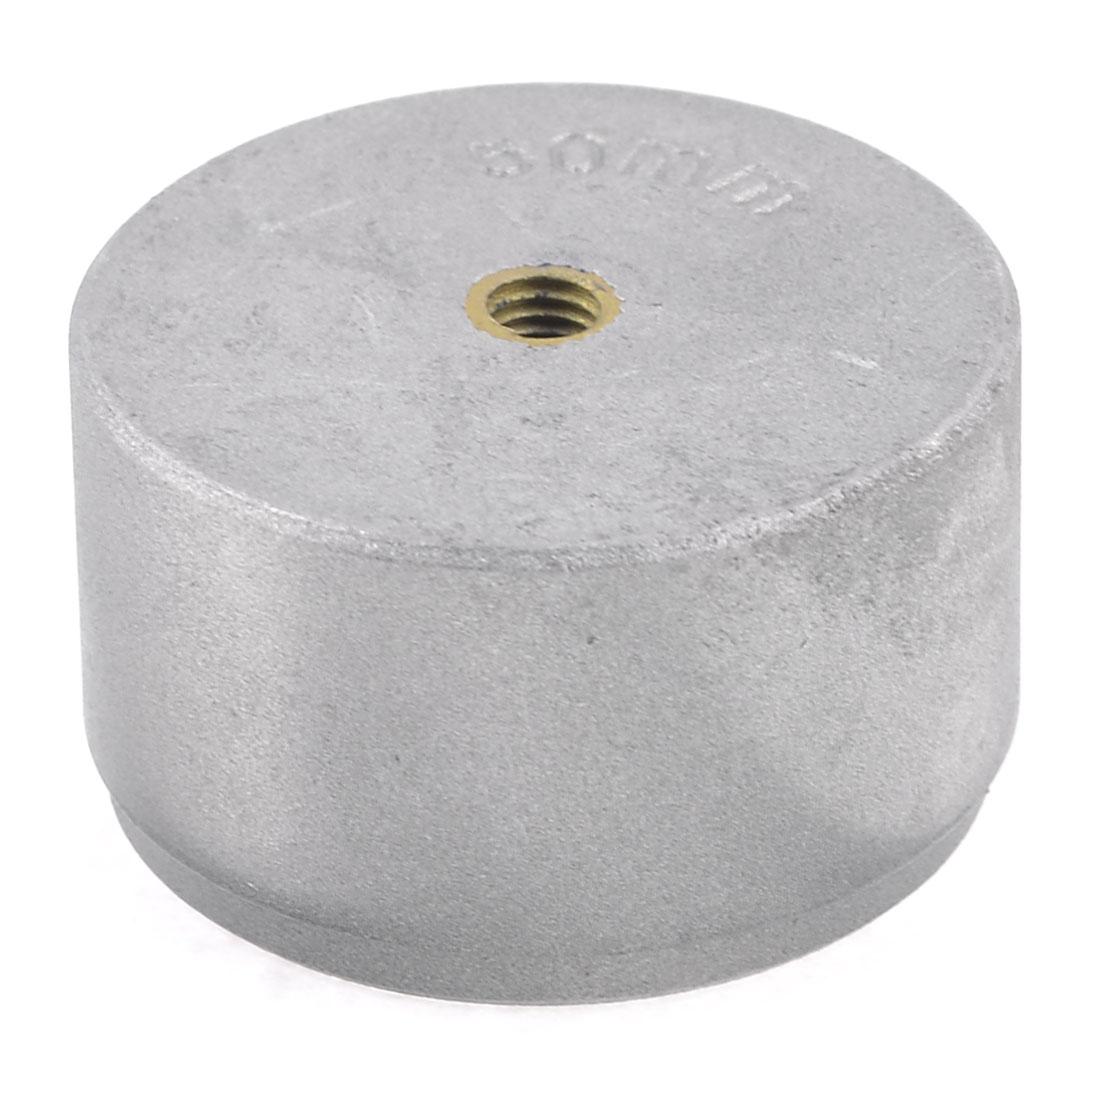 Welding Aluminum Soldering Material Jointing Tool Die Head Welder 50mm